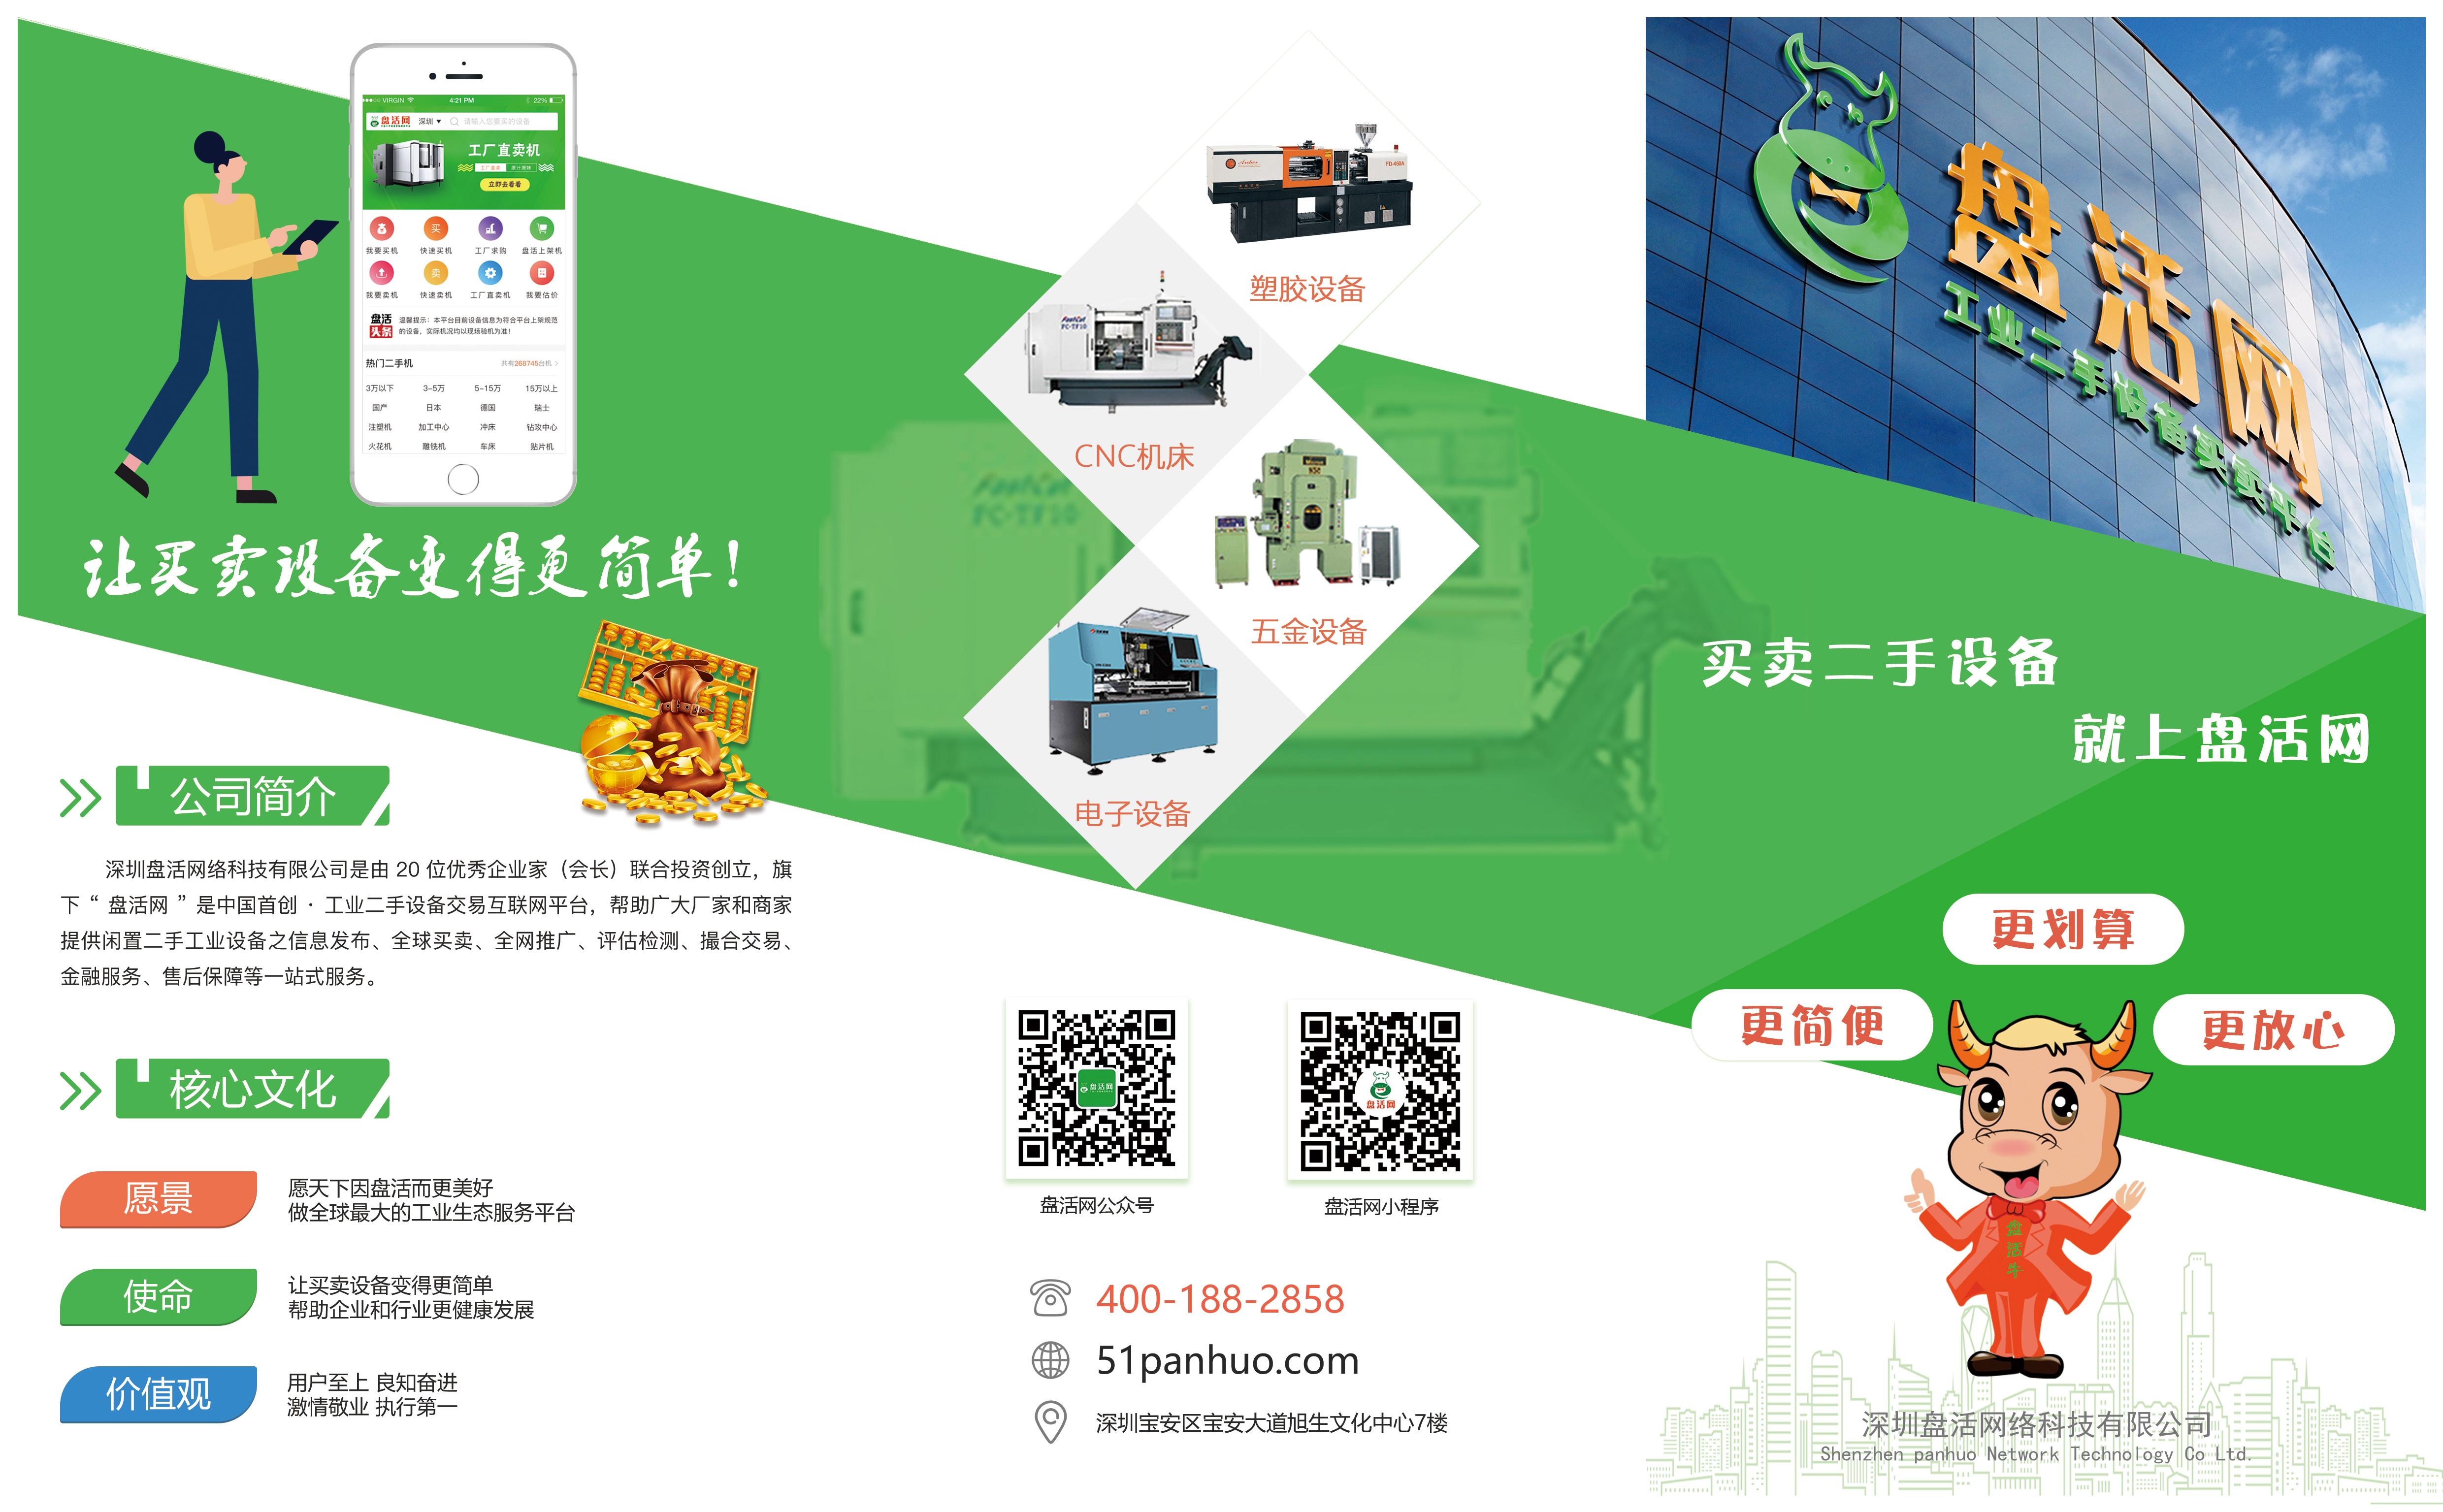 news_454615482378462443.jpg